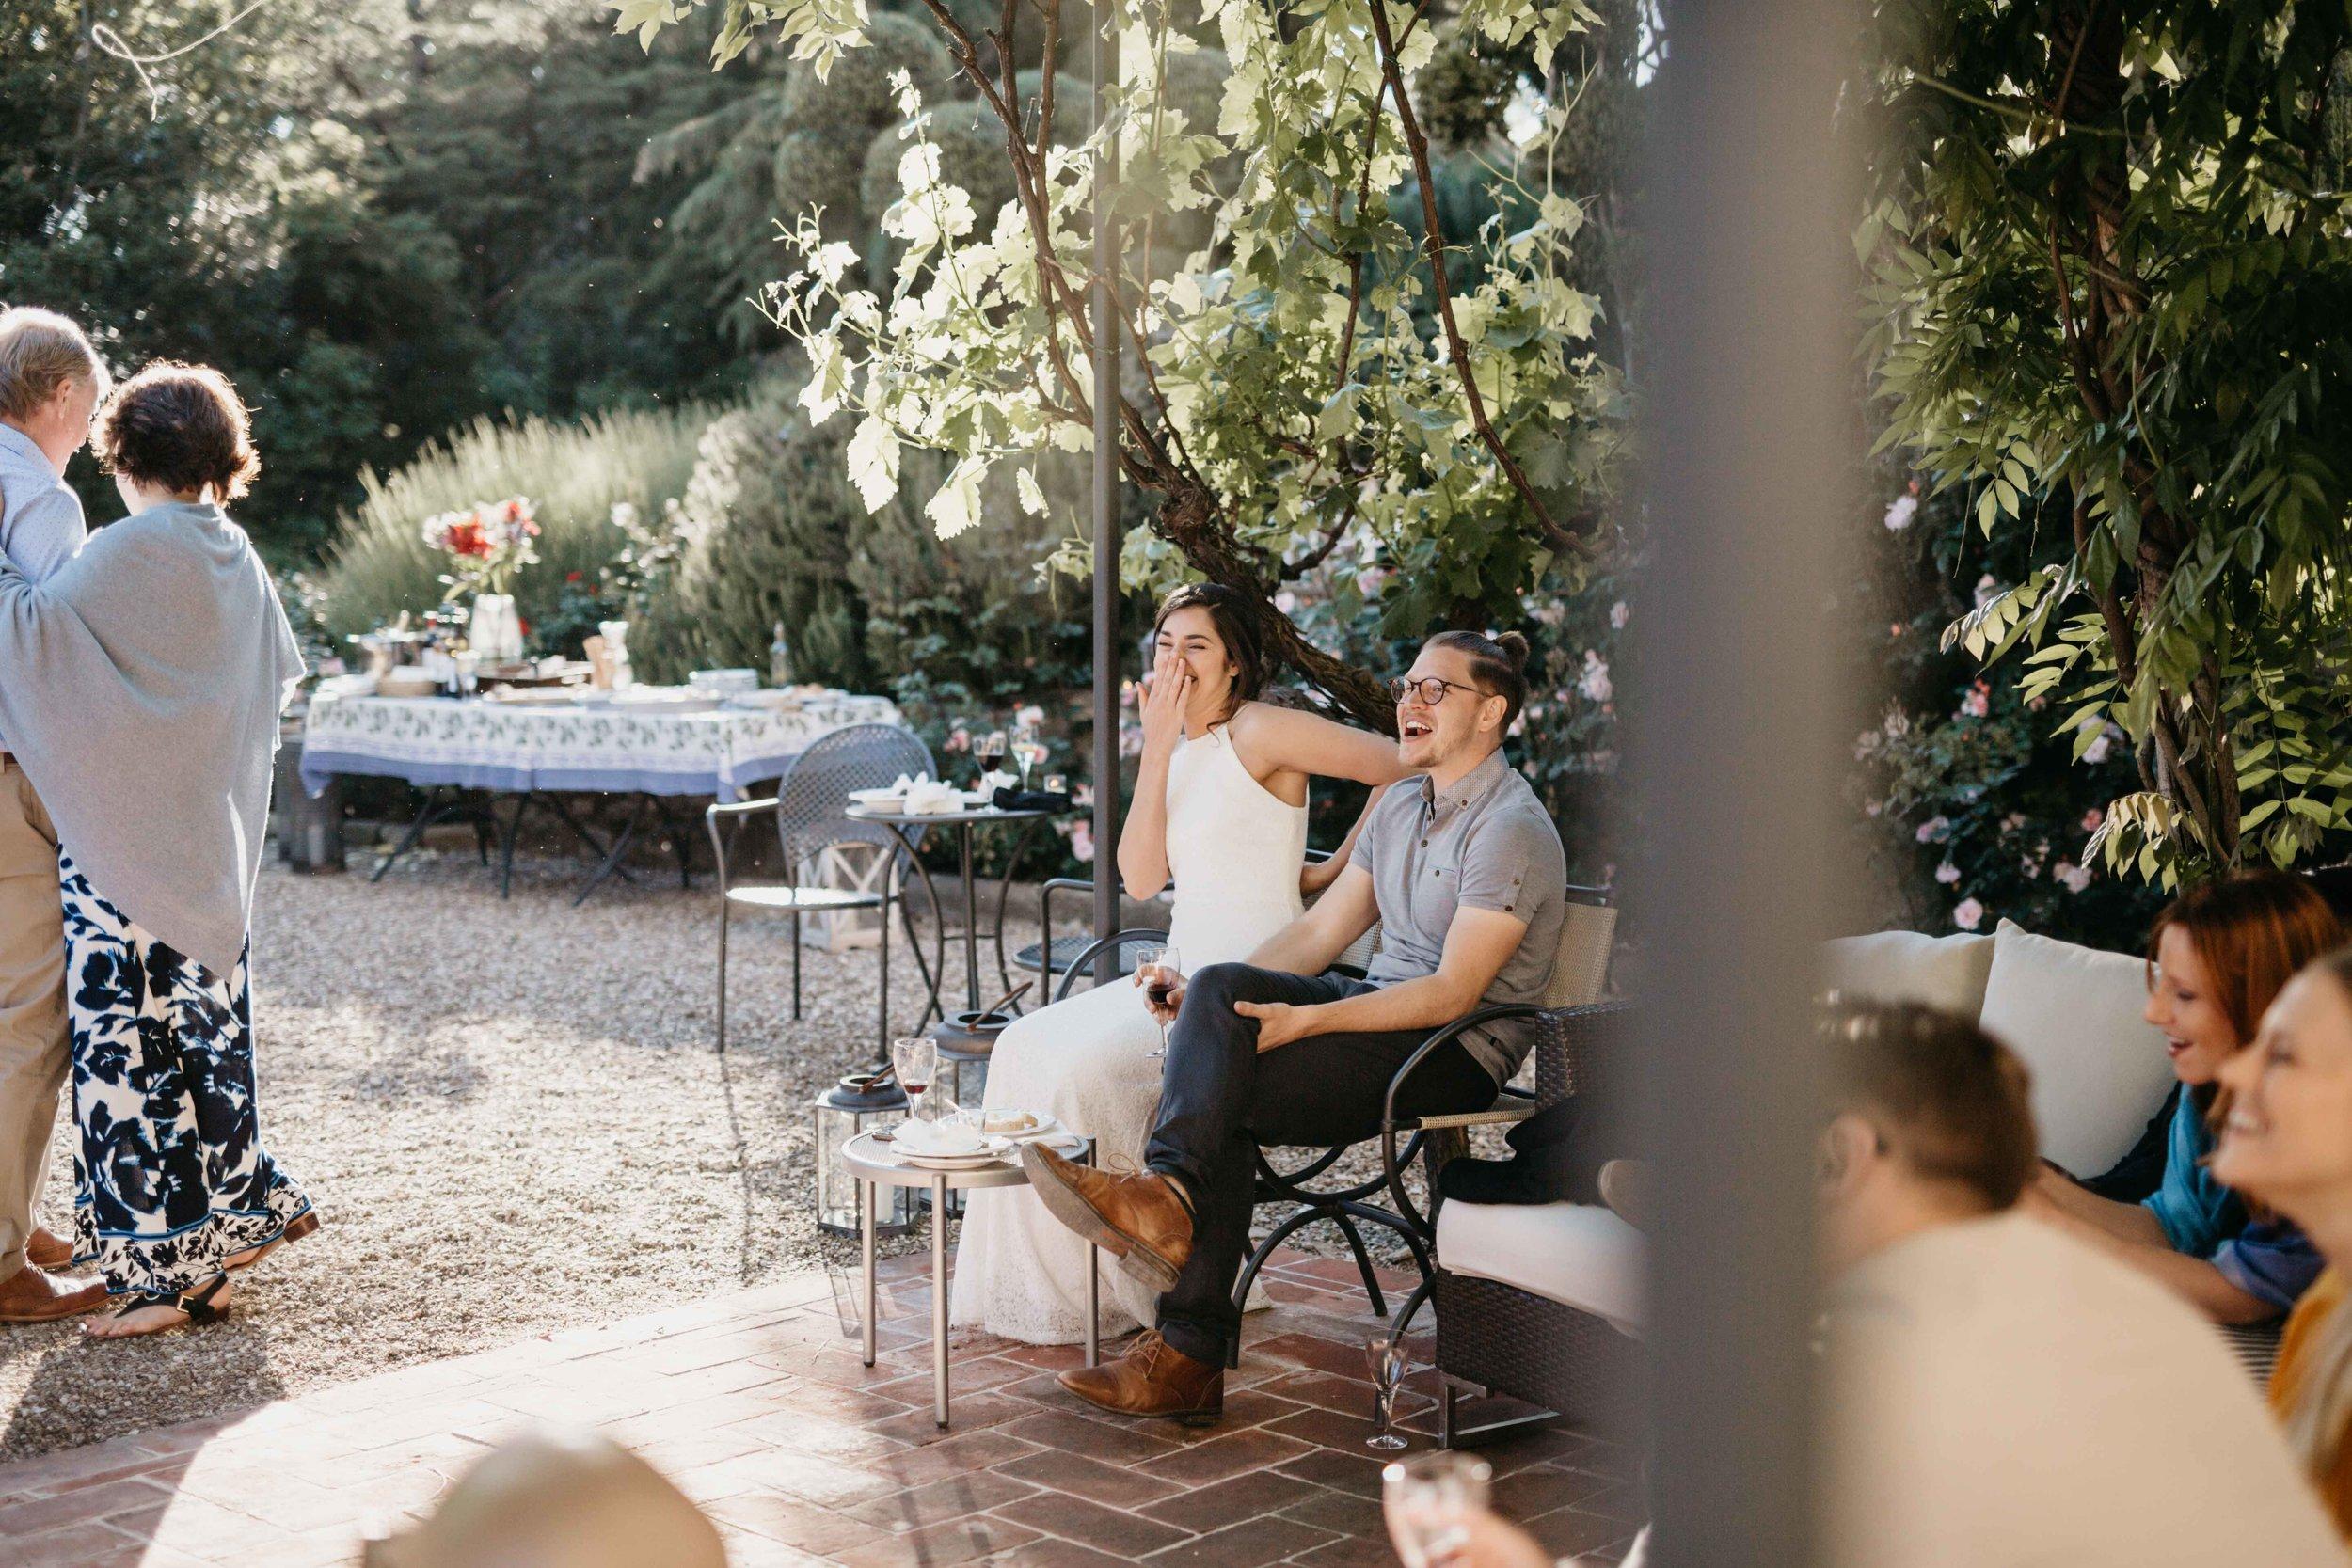 Utah-Wedding-Photographer-Tuscany-12.jpg